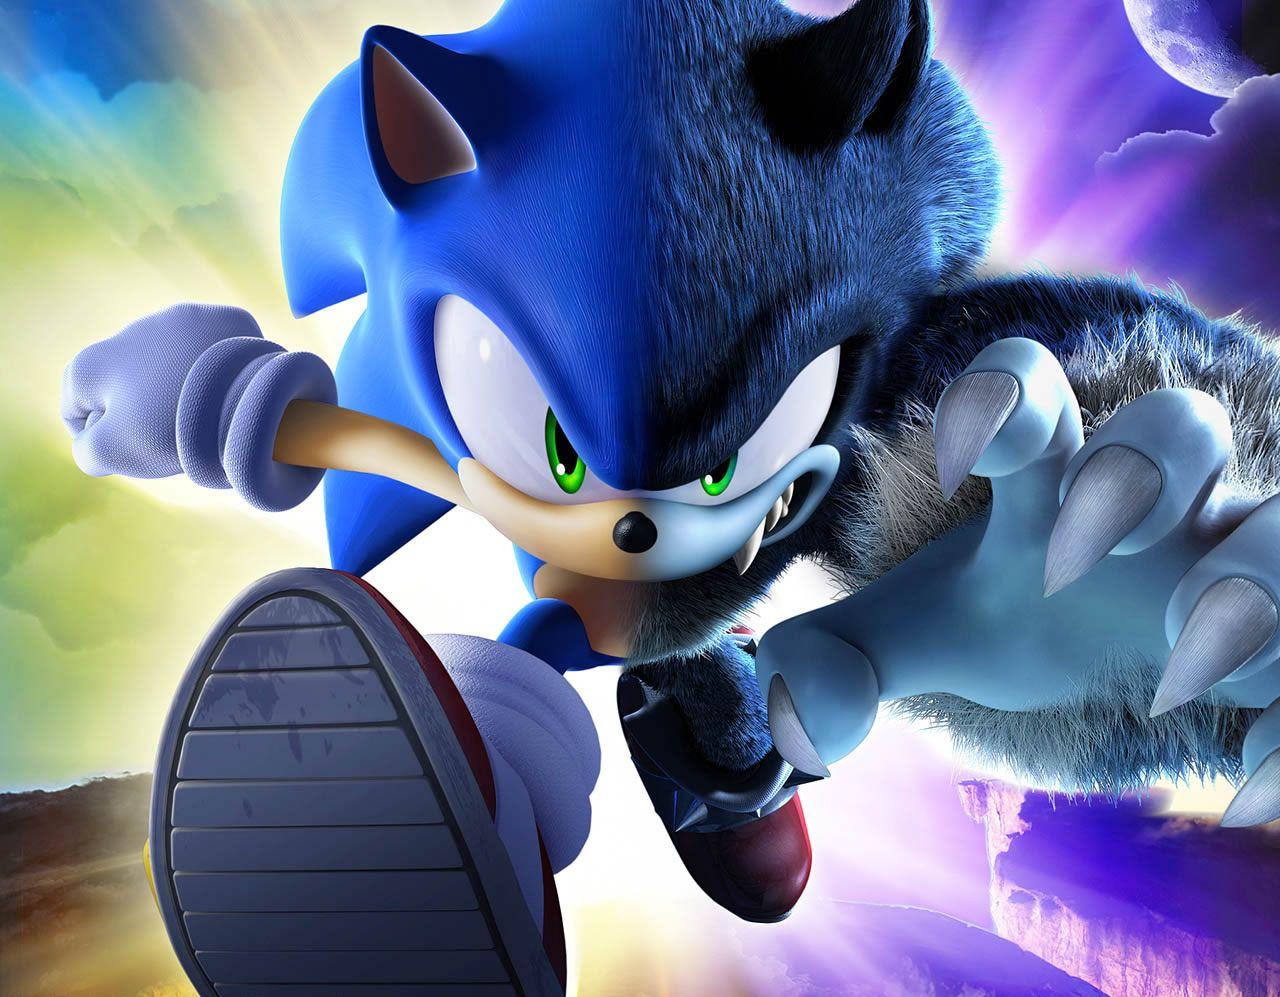 Pin On Jogos Do Sonic